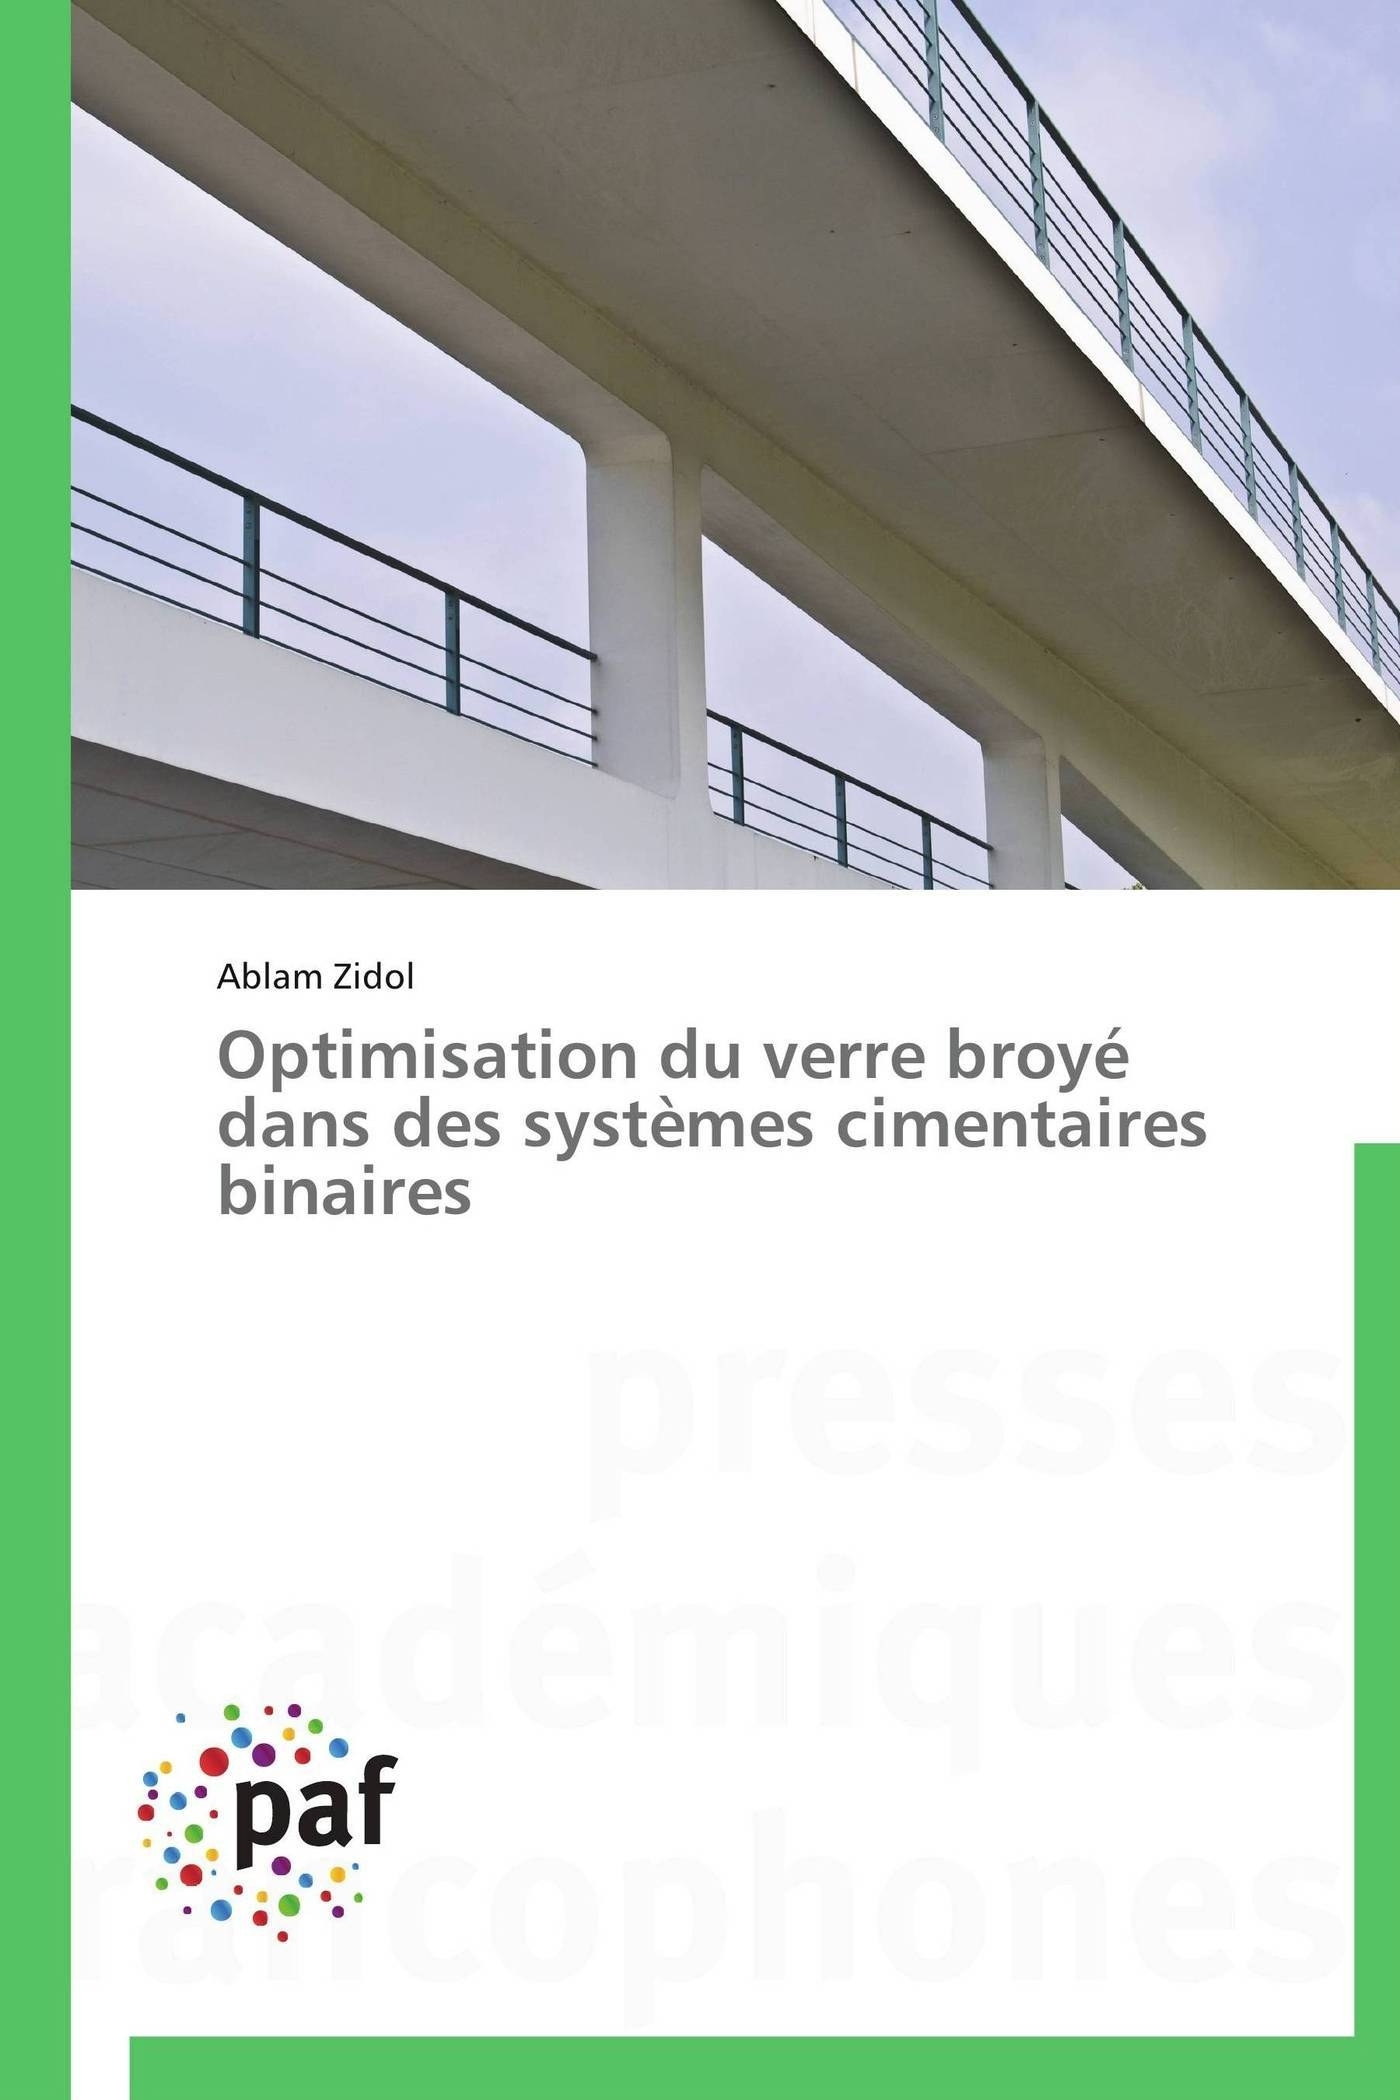 OPTIMISATION DU VERRE BROYE DANS DES SYSTEMES CIMENTAIRES BINAIRES